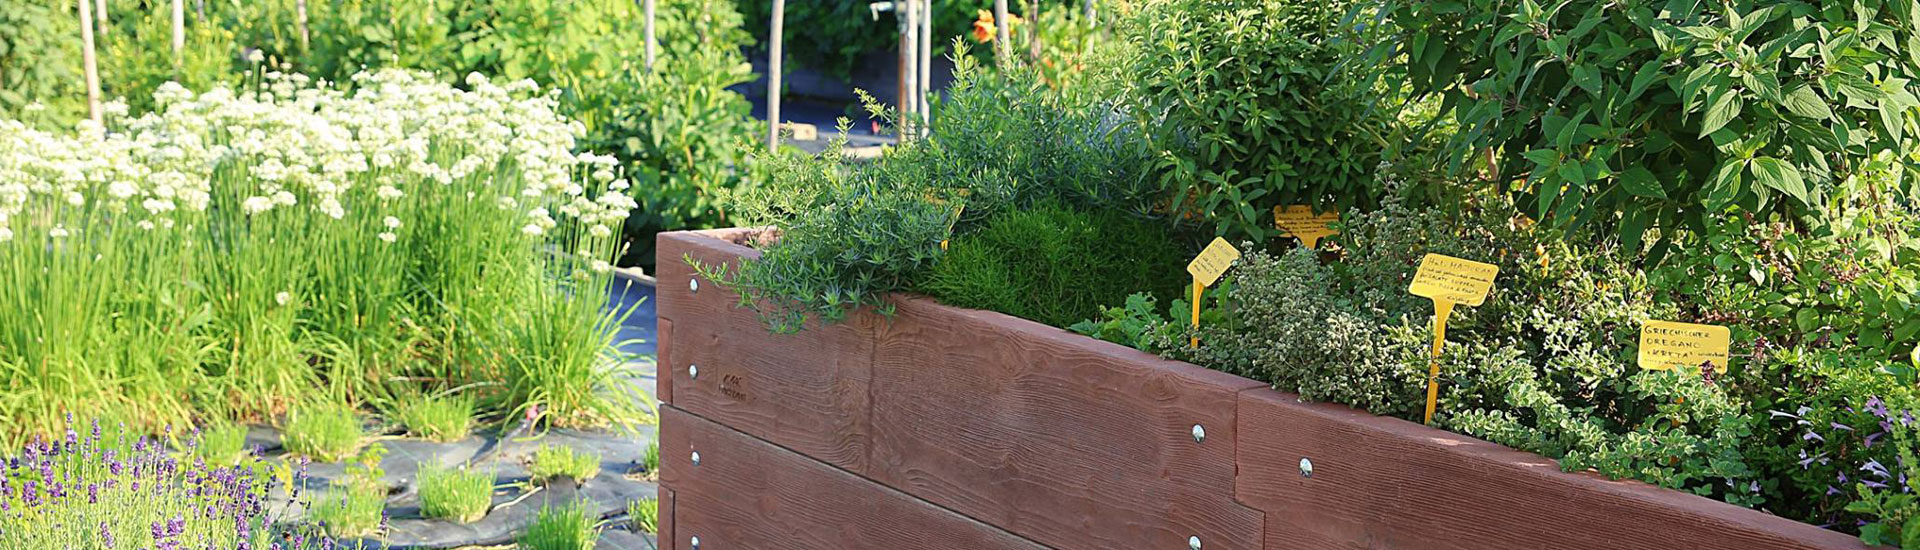 Gärtnerei Ganger | Hochbeetgarten